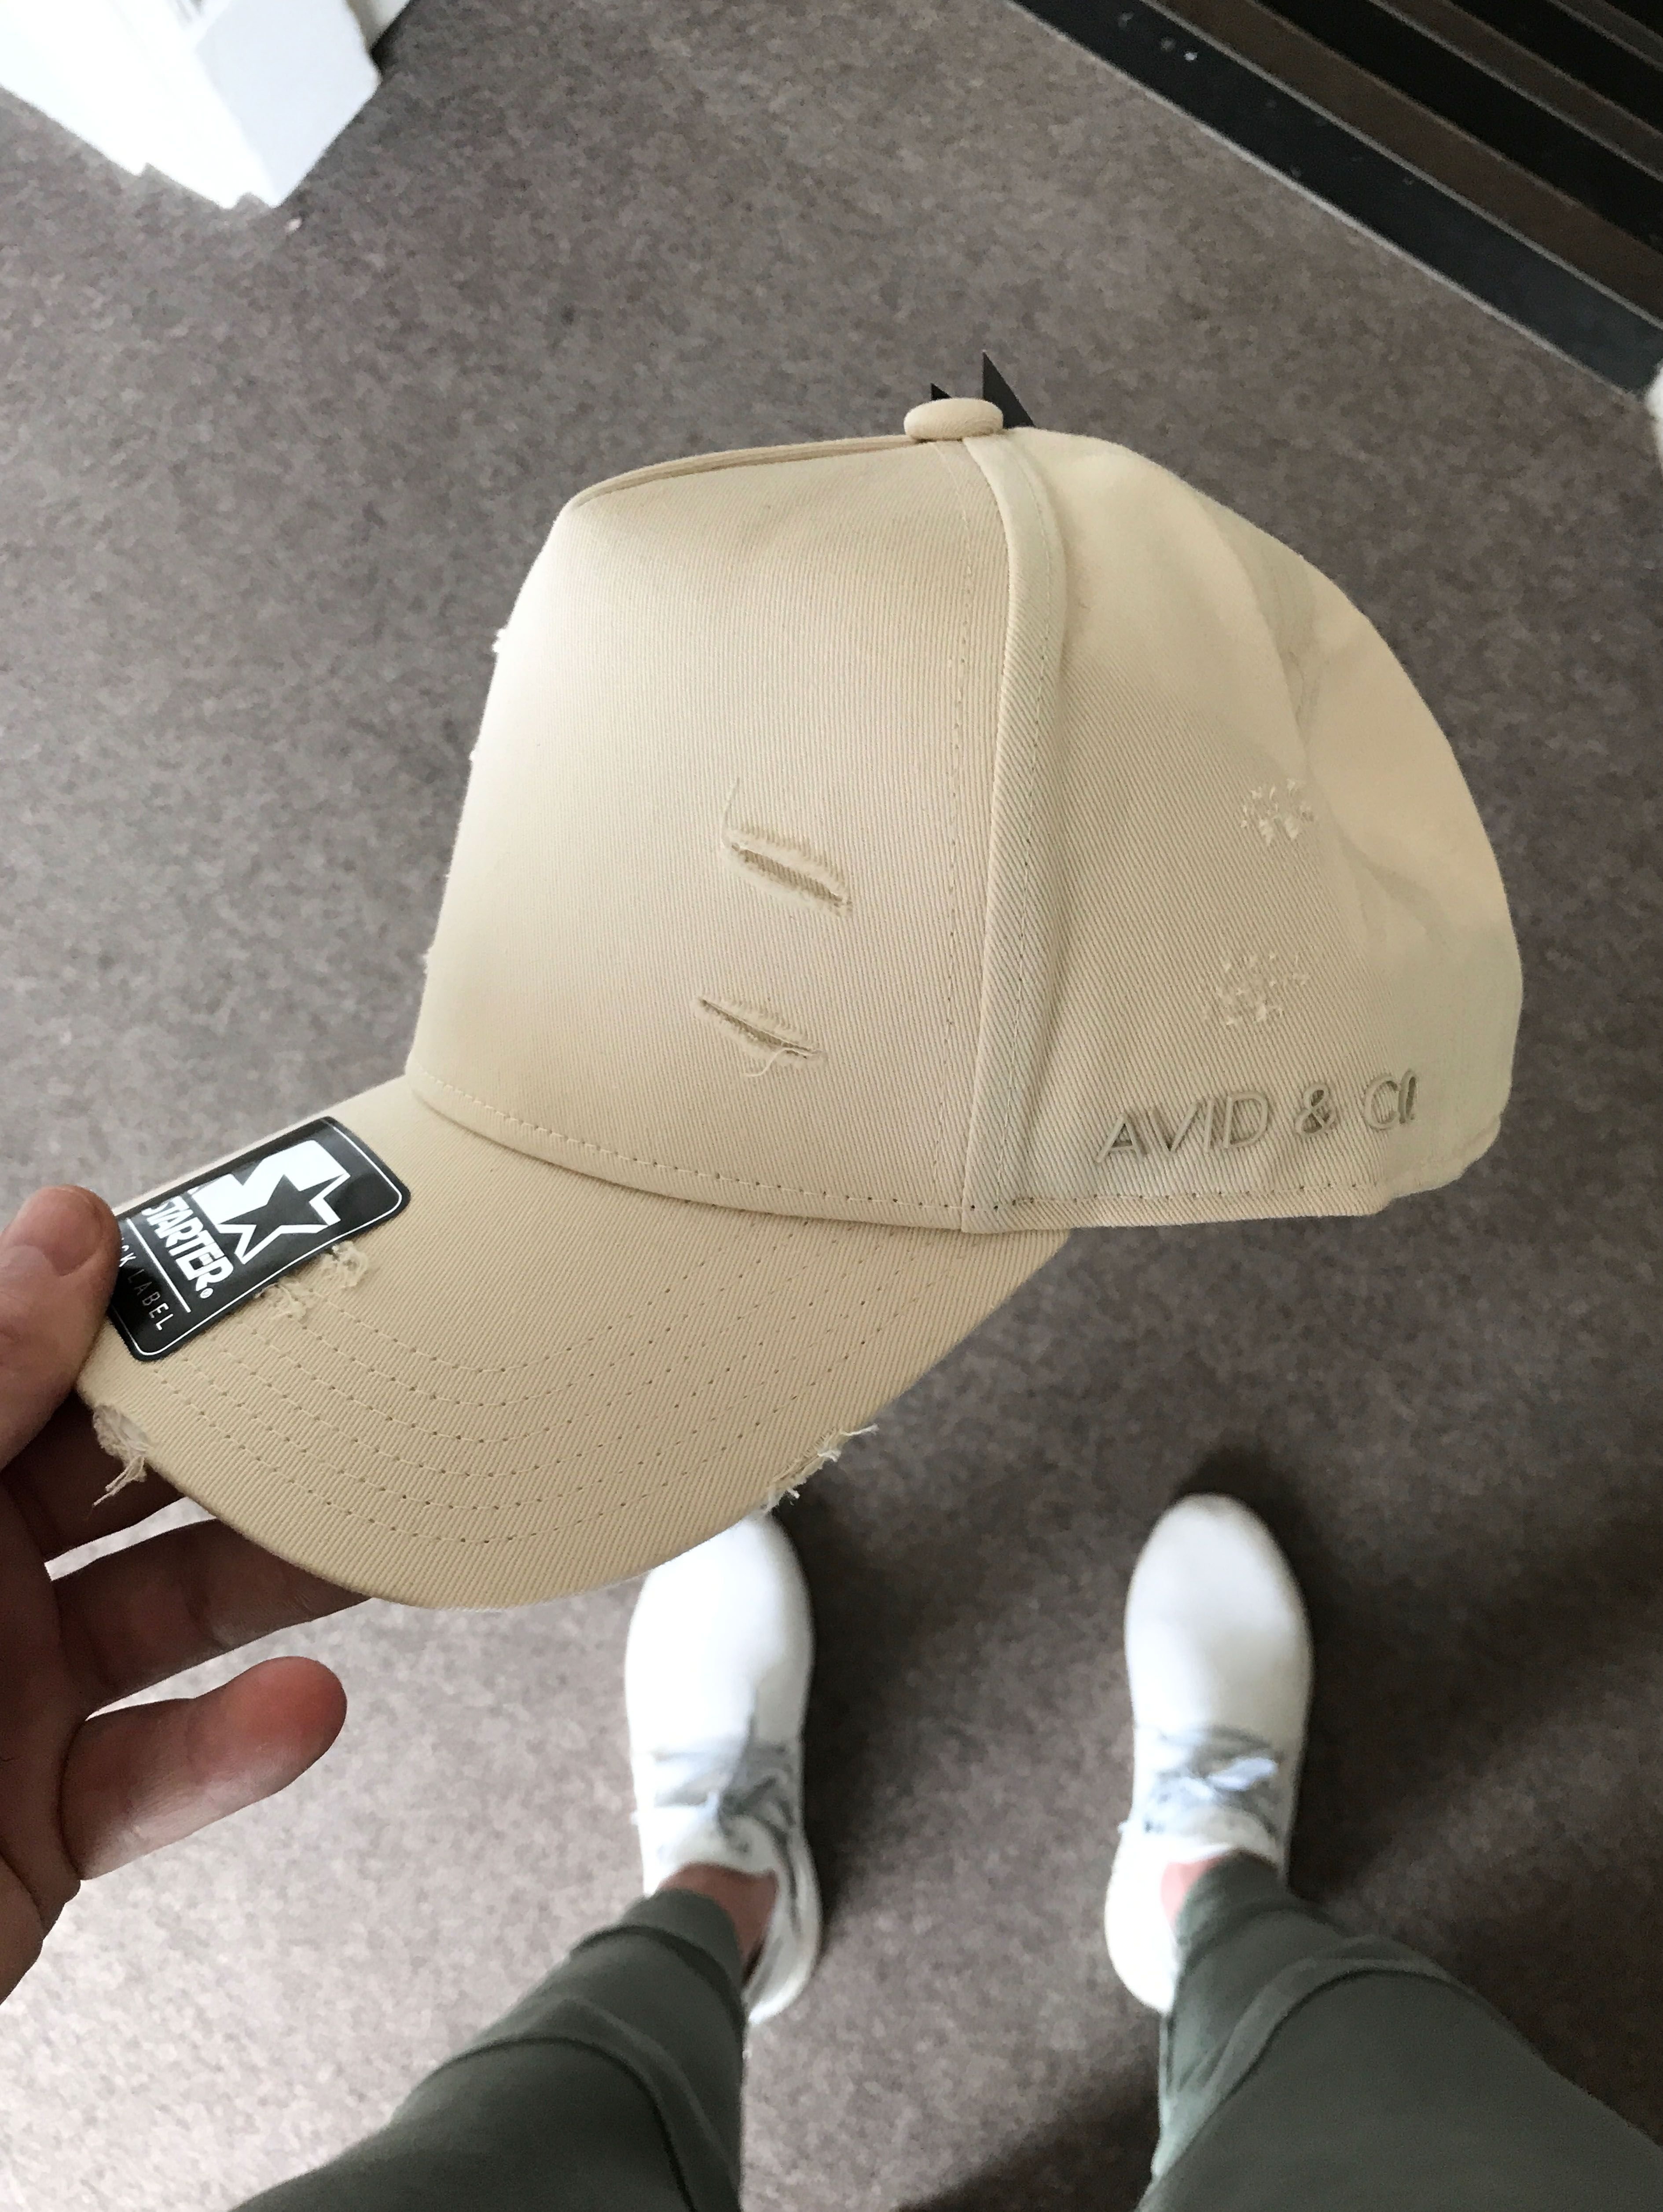 5377c8372ead46 Avid & Co. Off-White Trucker Hat | Crooked | Hats, Hats for men ...